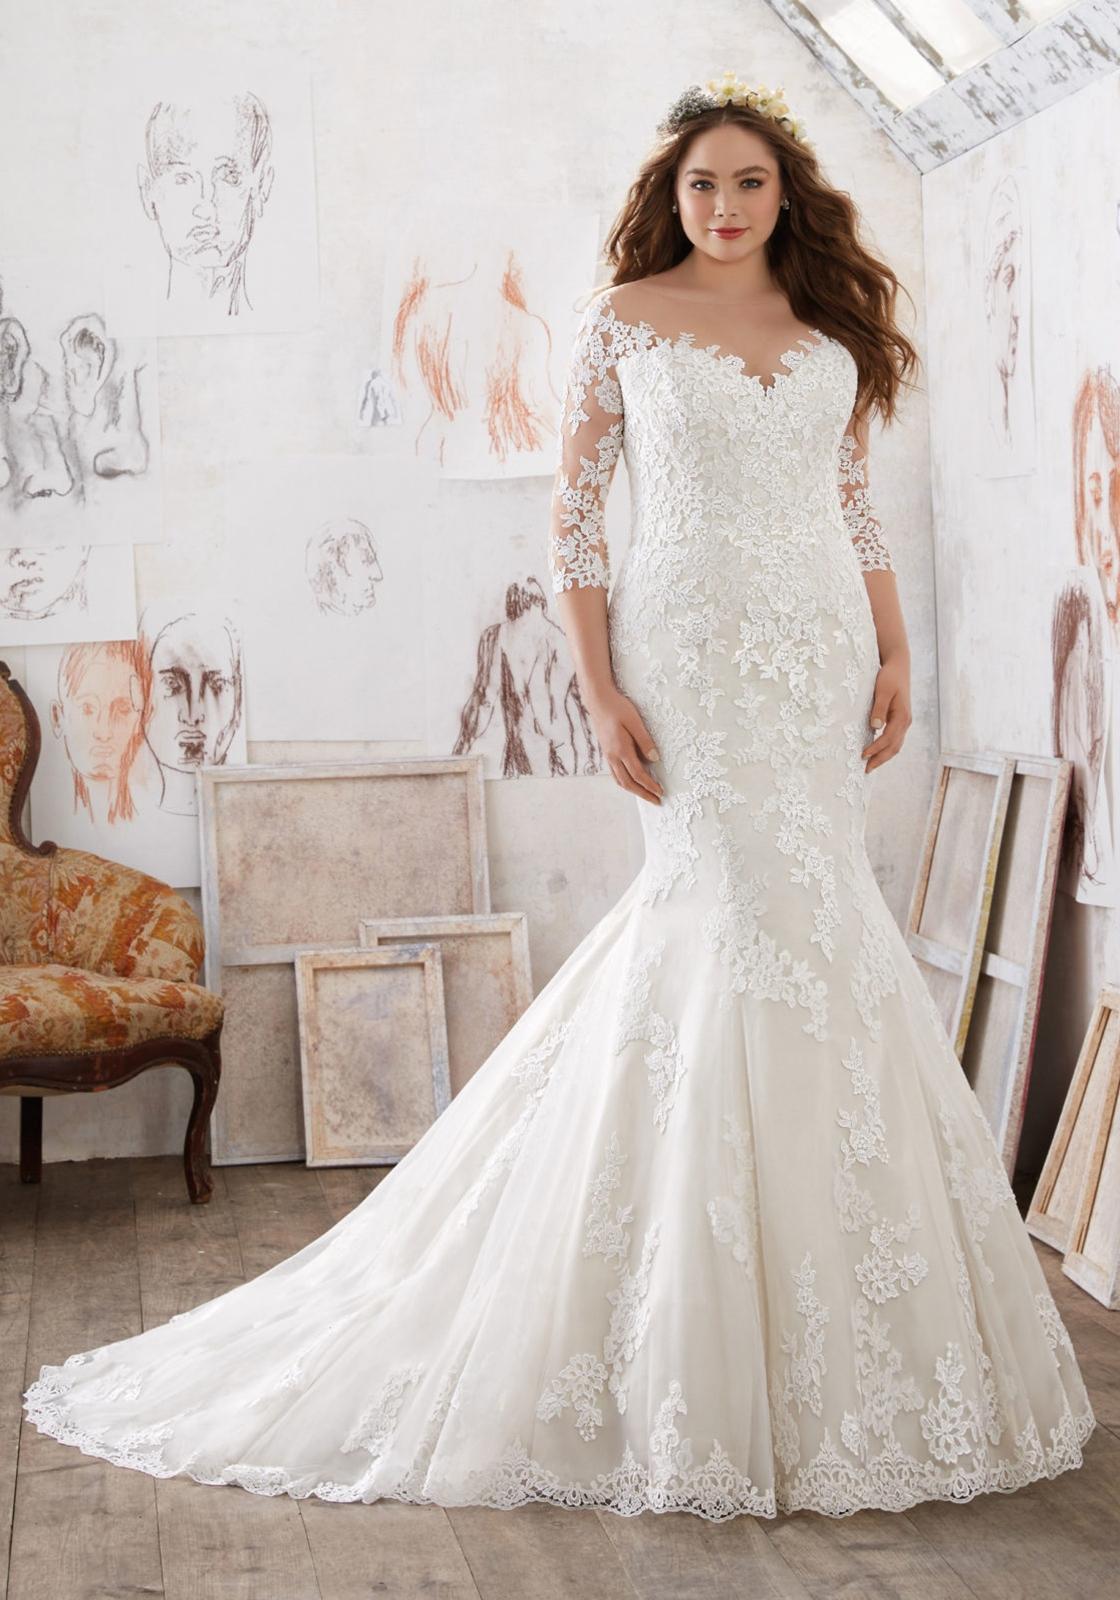 c 37 plus size wedding dresses wedding dress online Julietta